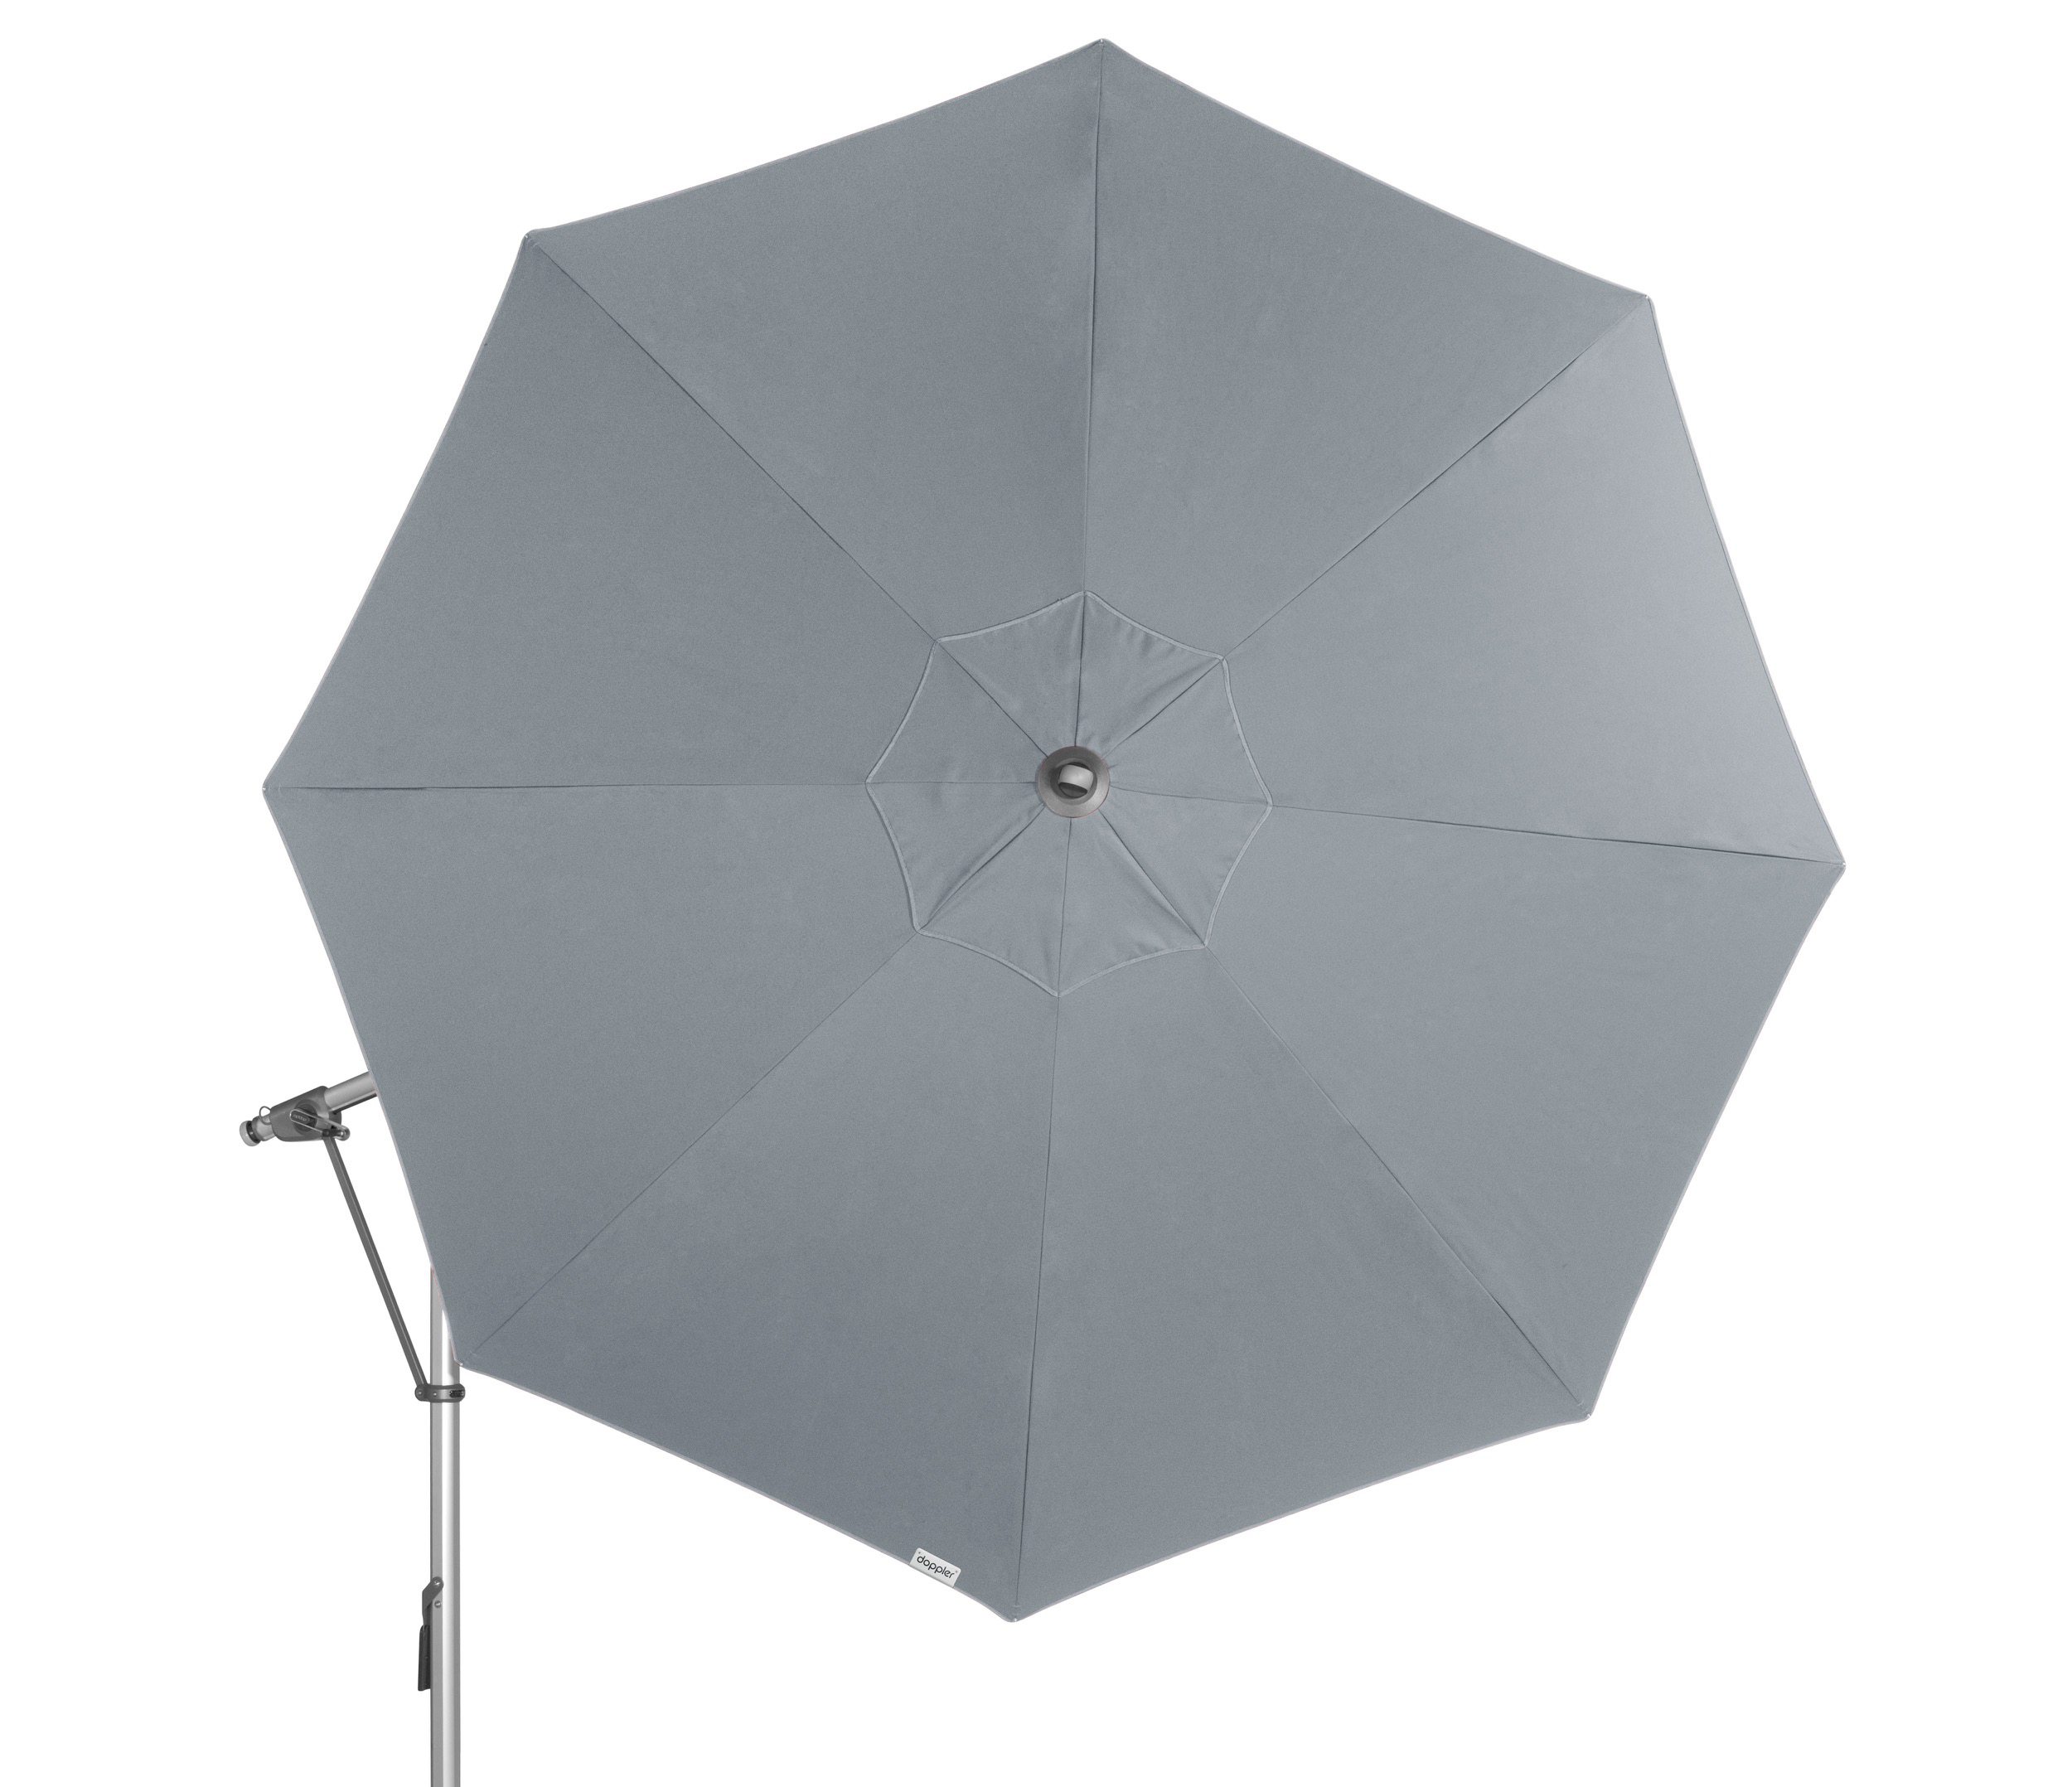 Doppler Ampelschirm / Pendelschirm Expert 350cm Des. T827 hellgrau Bild 5